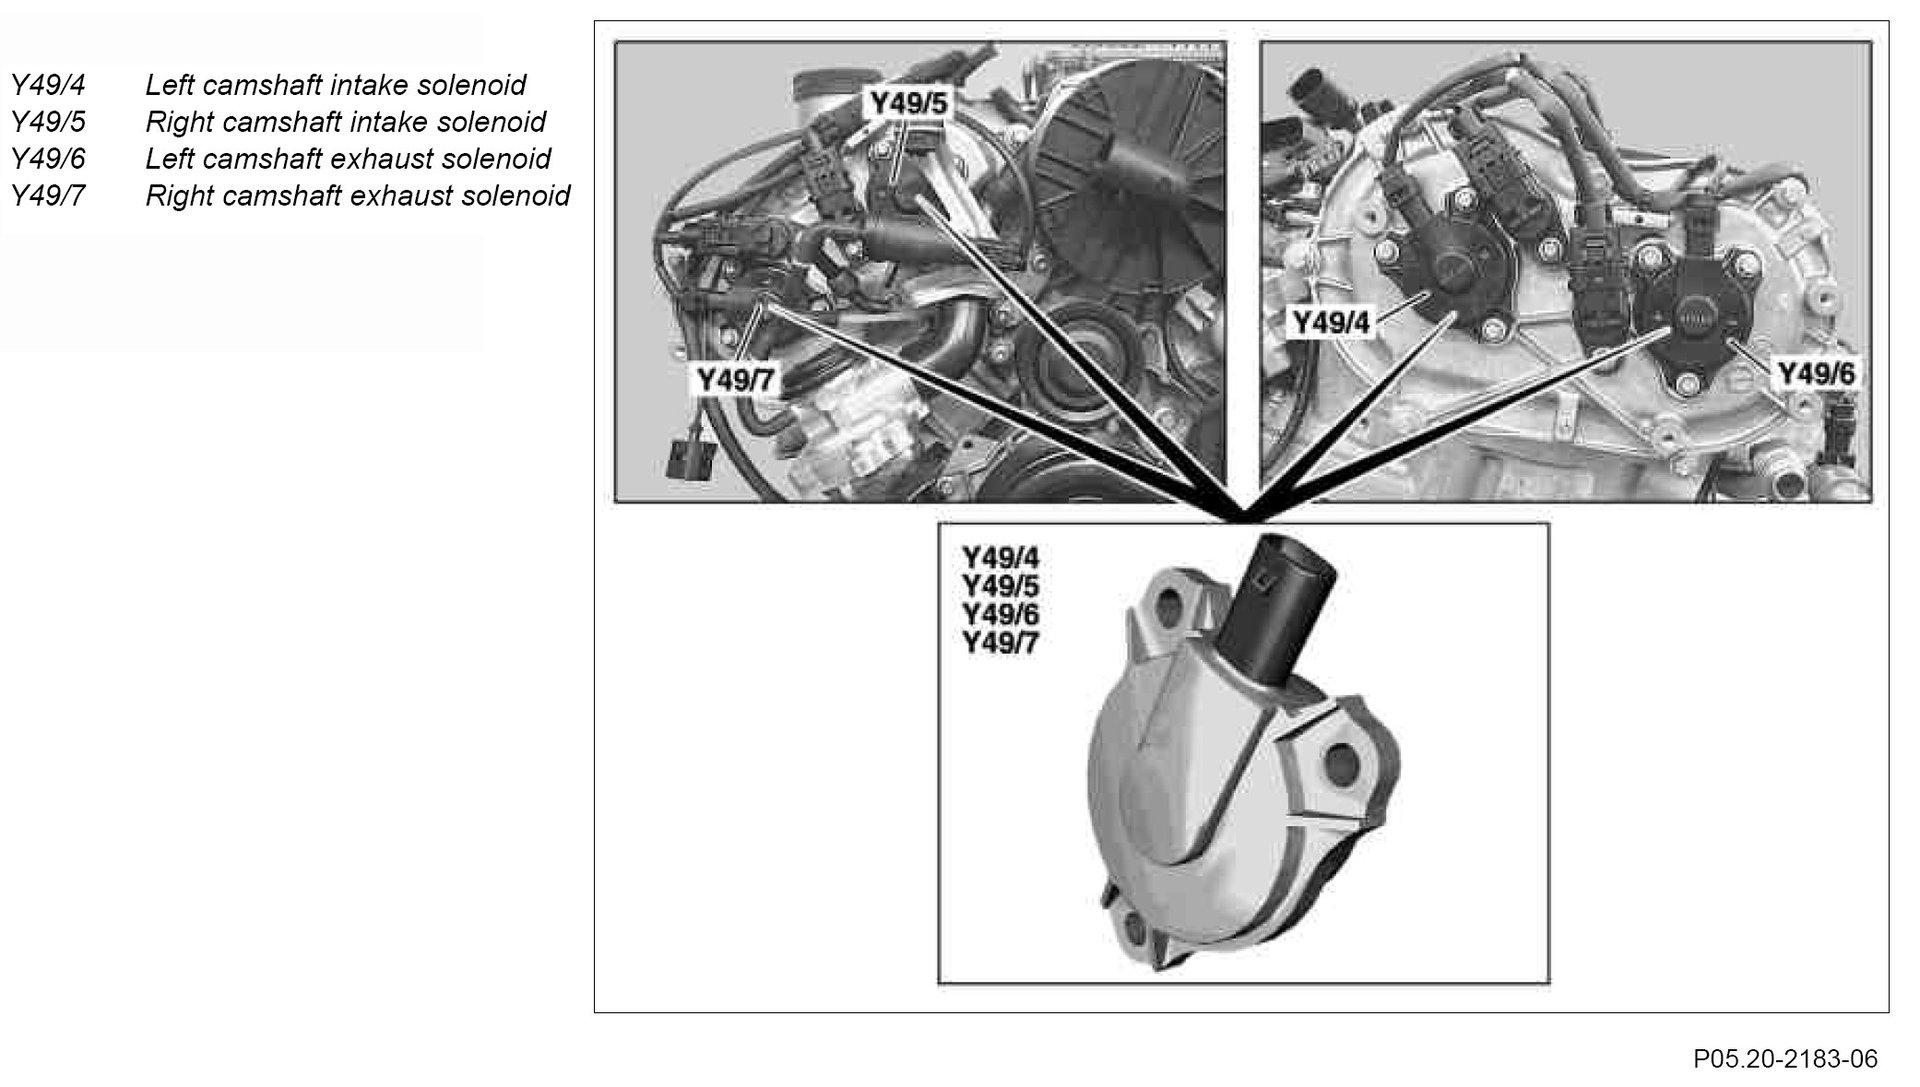 06 mlk 350 p0017 code | Mercedes-Benz Forum